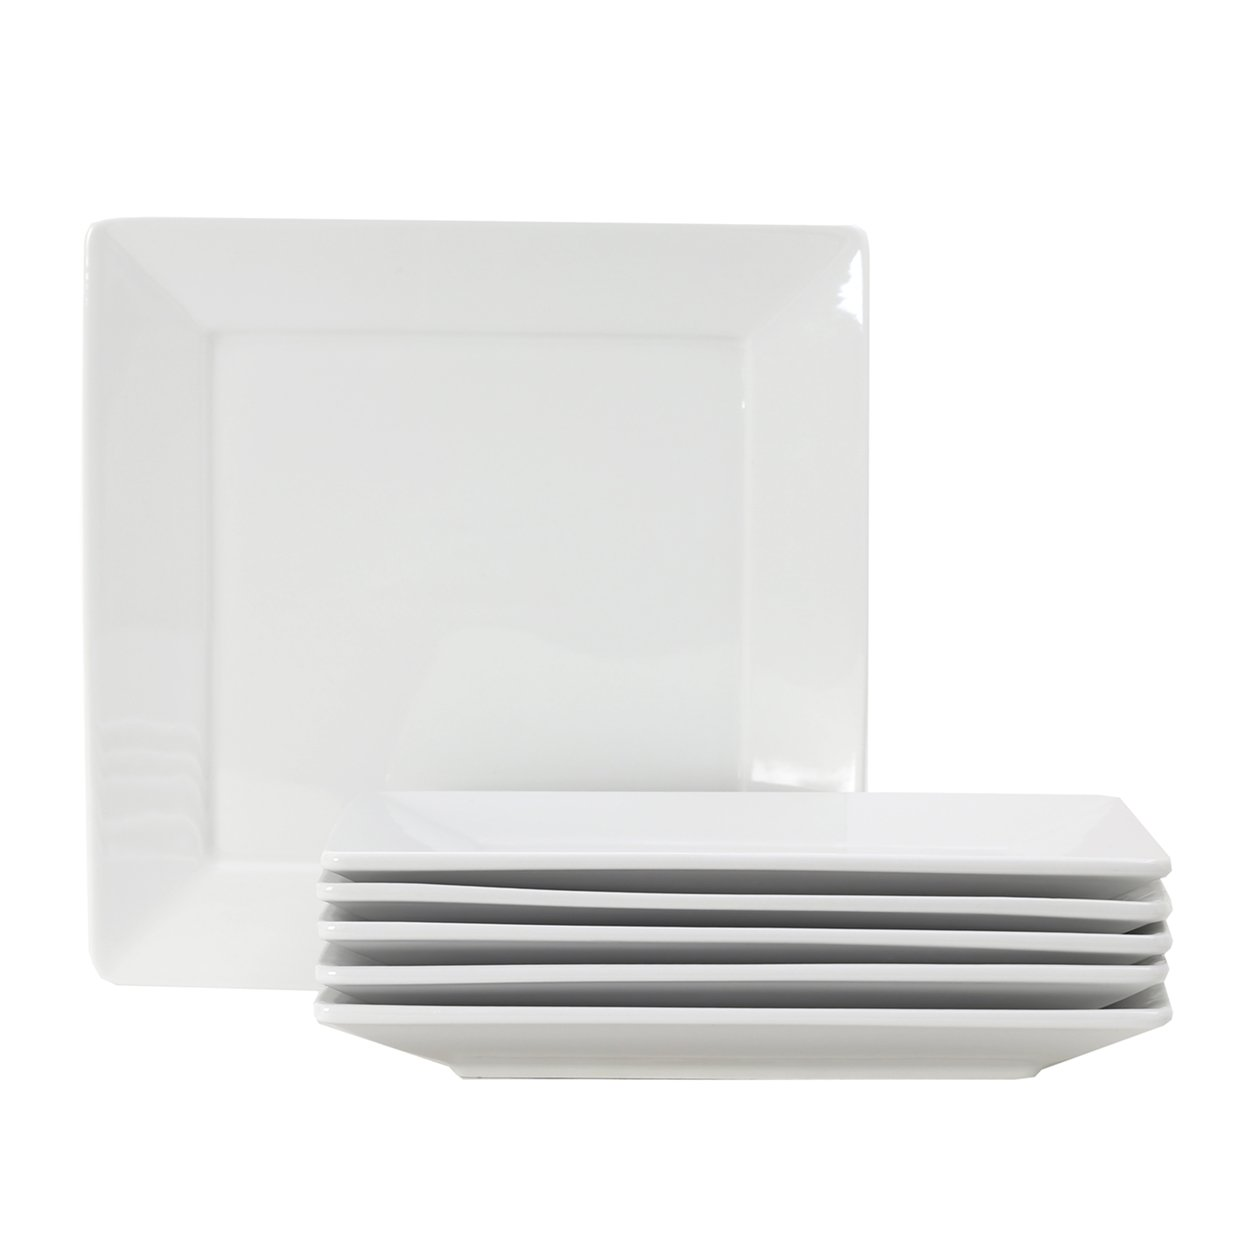 Tuxton Home Santorini Square Plate 10 1/8'' x 10 1/8'' Porcelain White - Set of 6; Commercial Grade Nonporous Virtrified China;